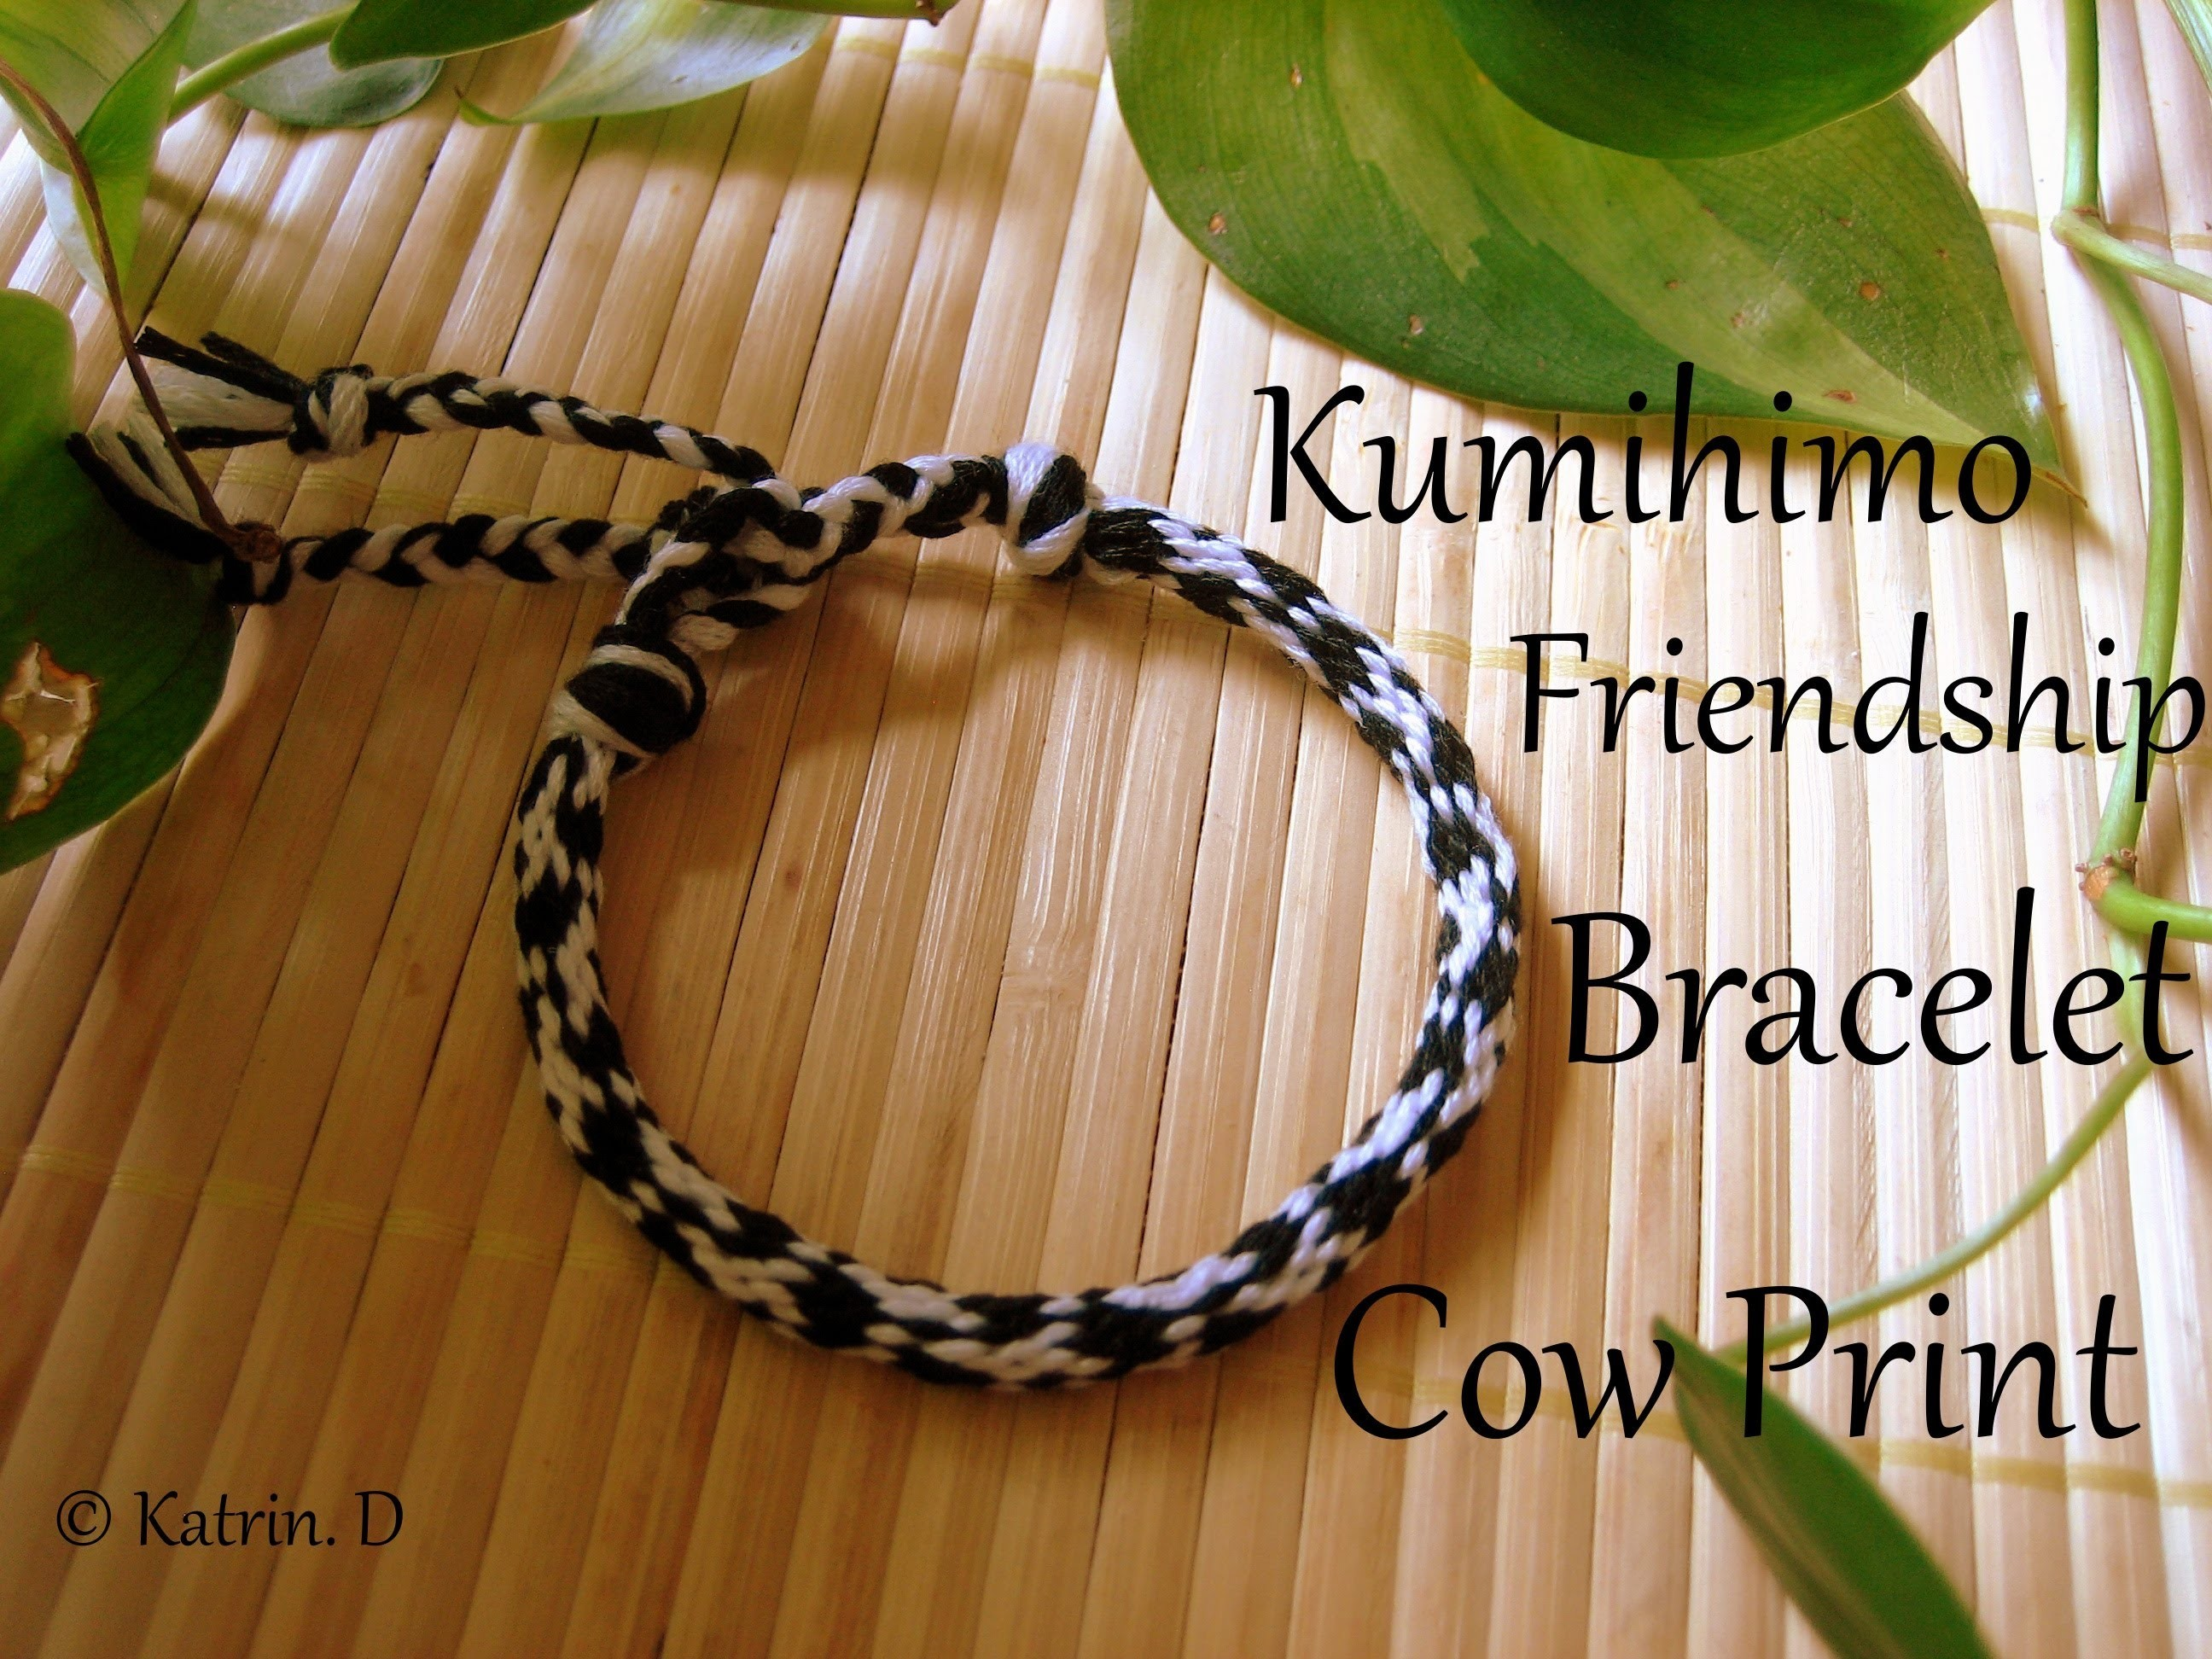 Kumihimo Friendship Bracelet Cow Print